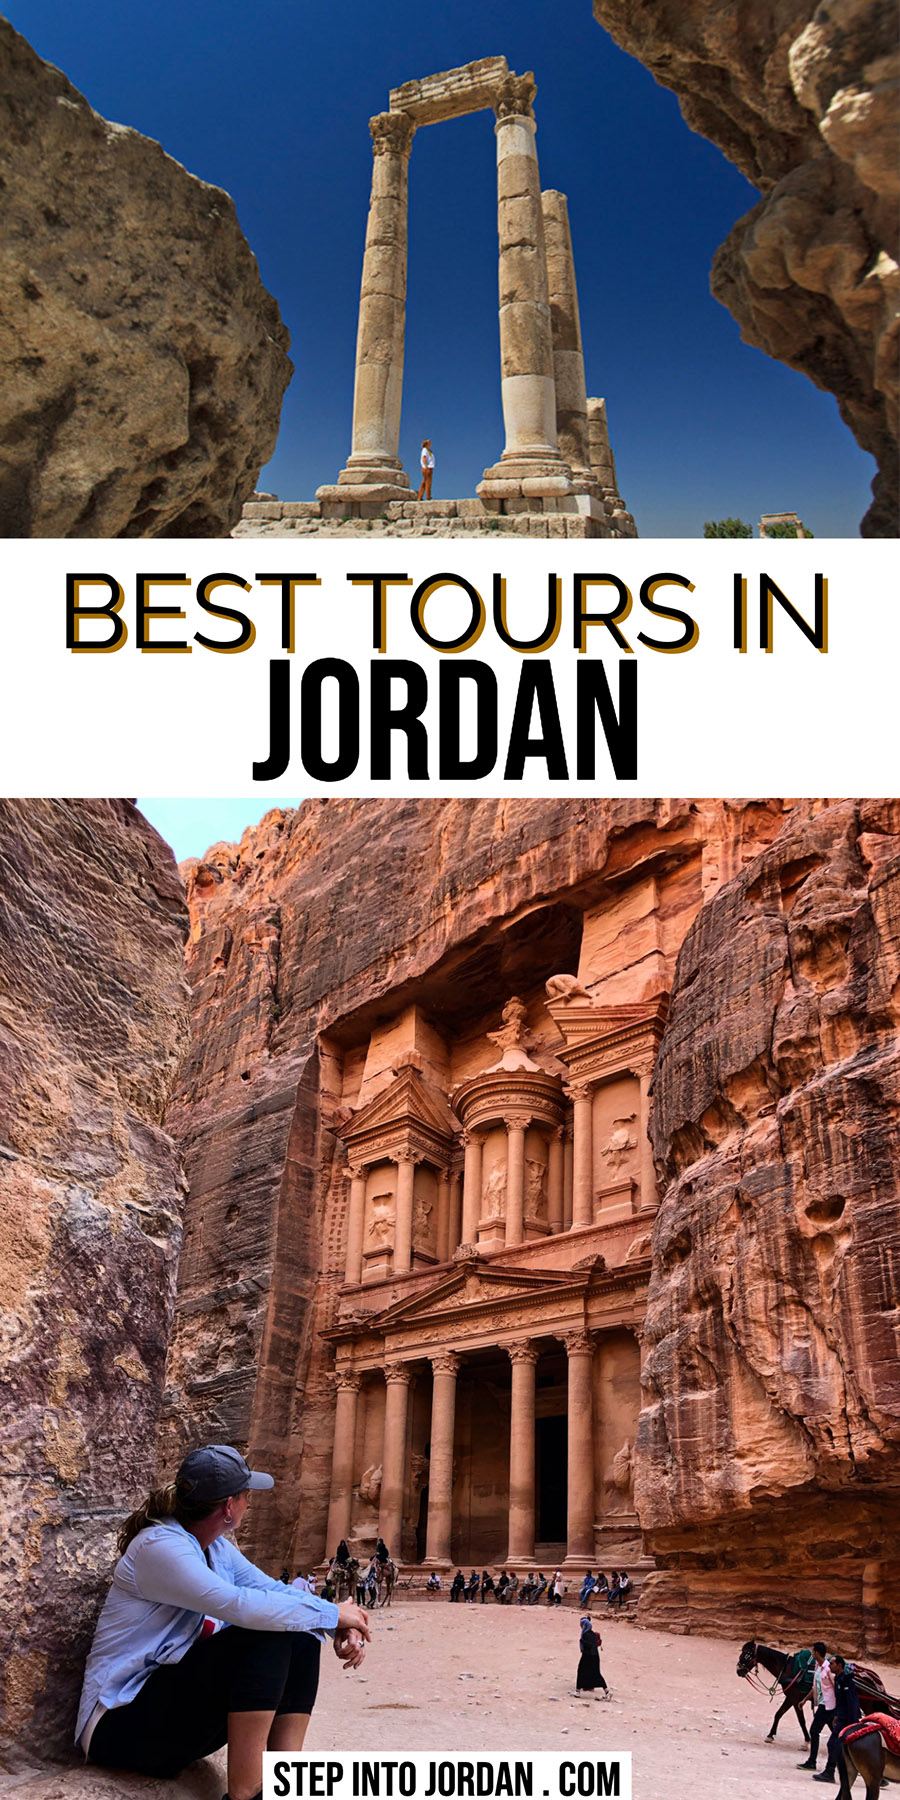 Best Tours in Jordan You Should Take